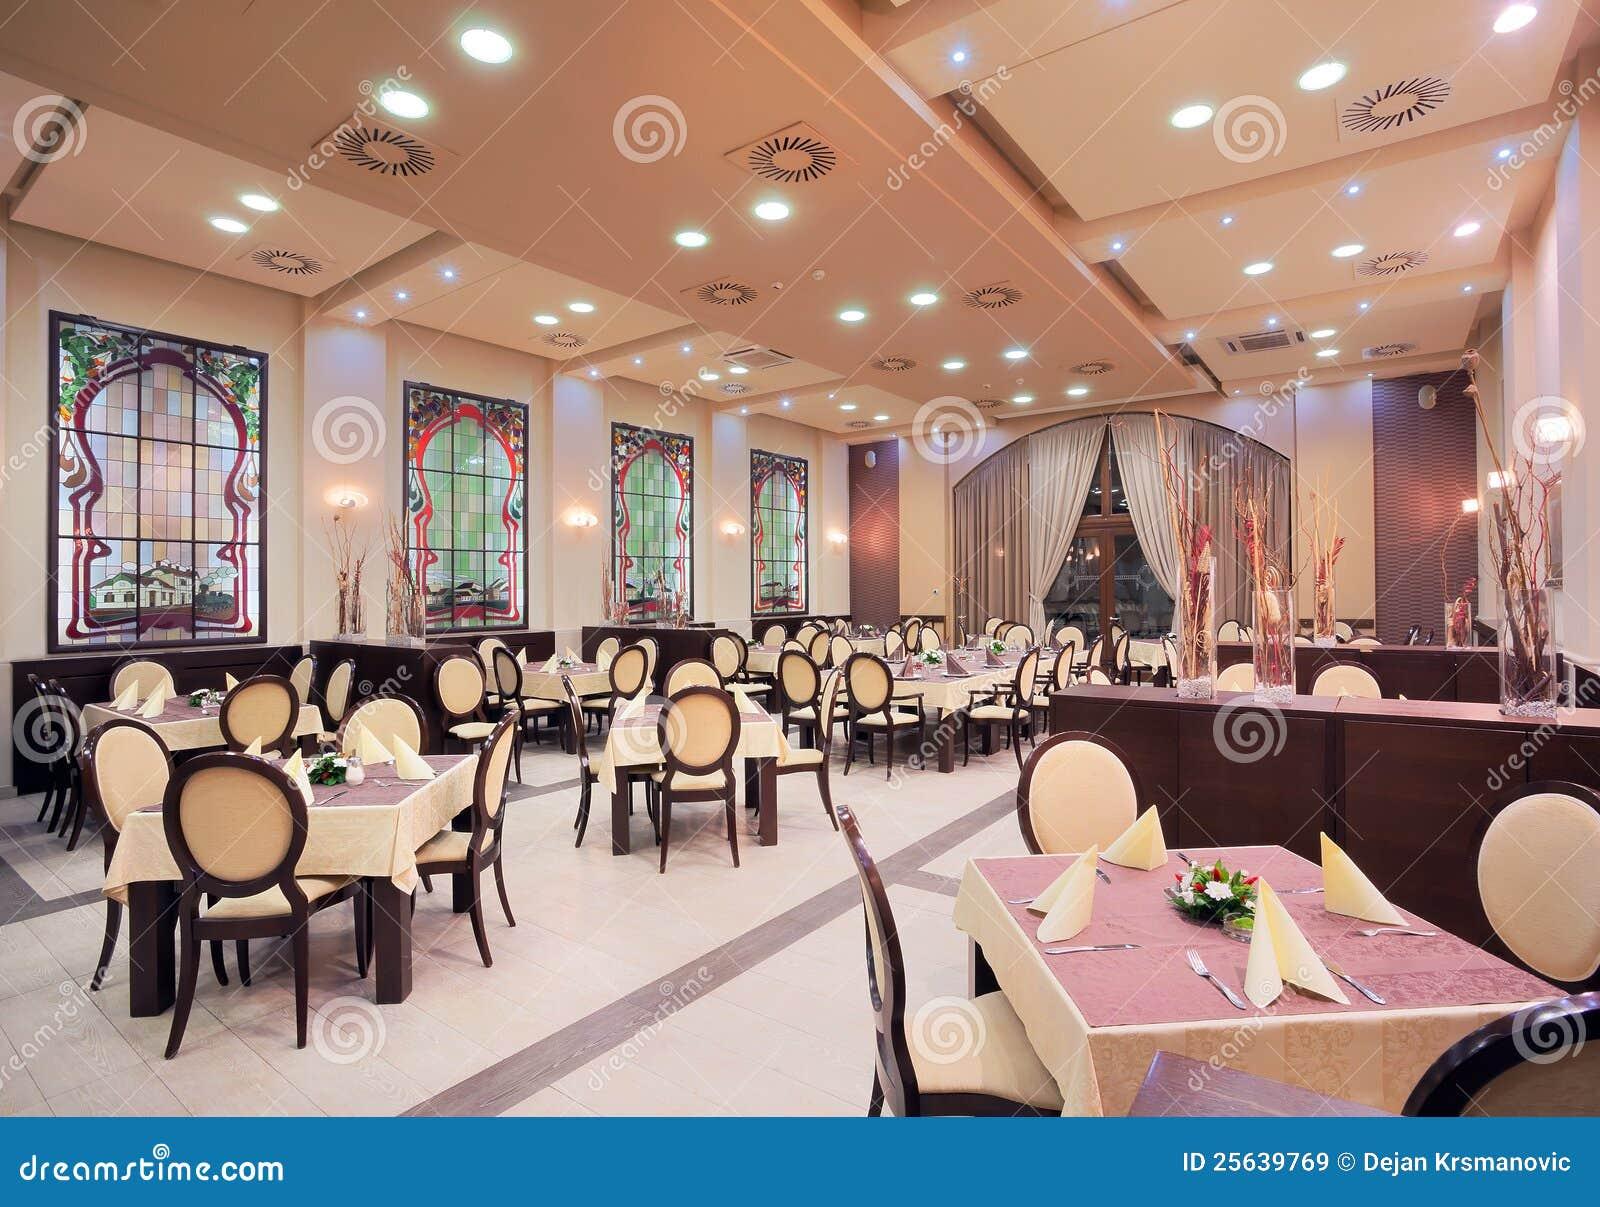 Modern hotel restaurant images for Cuisine moderne